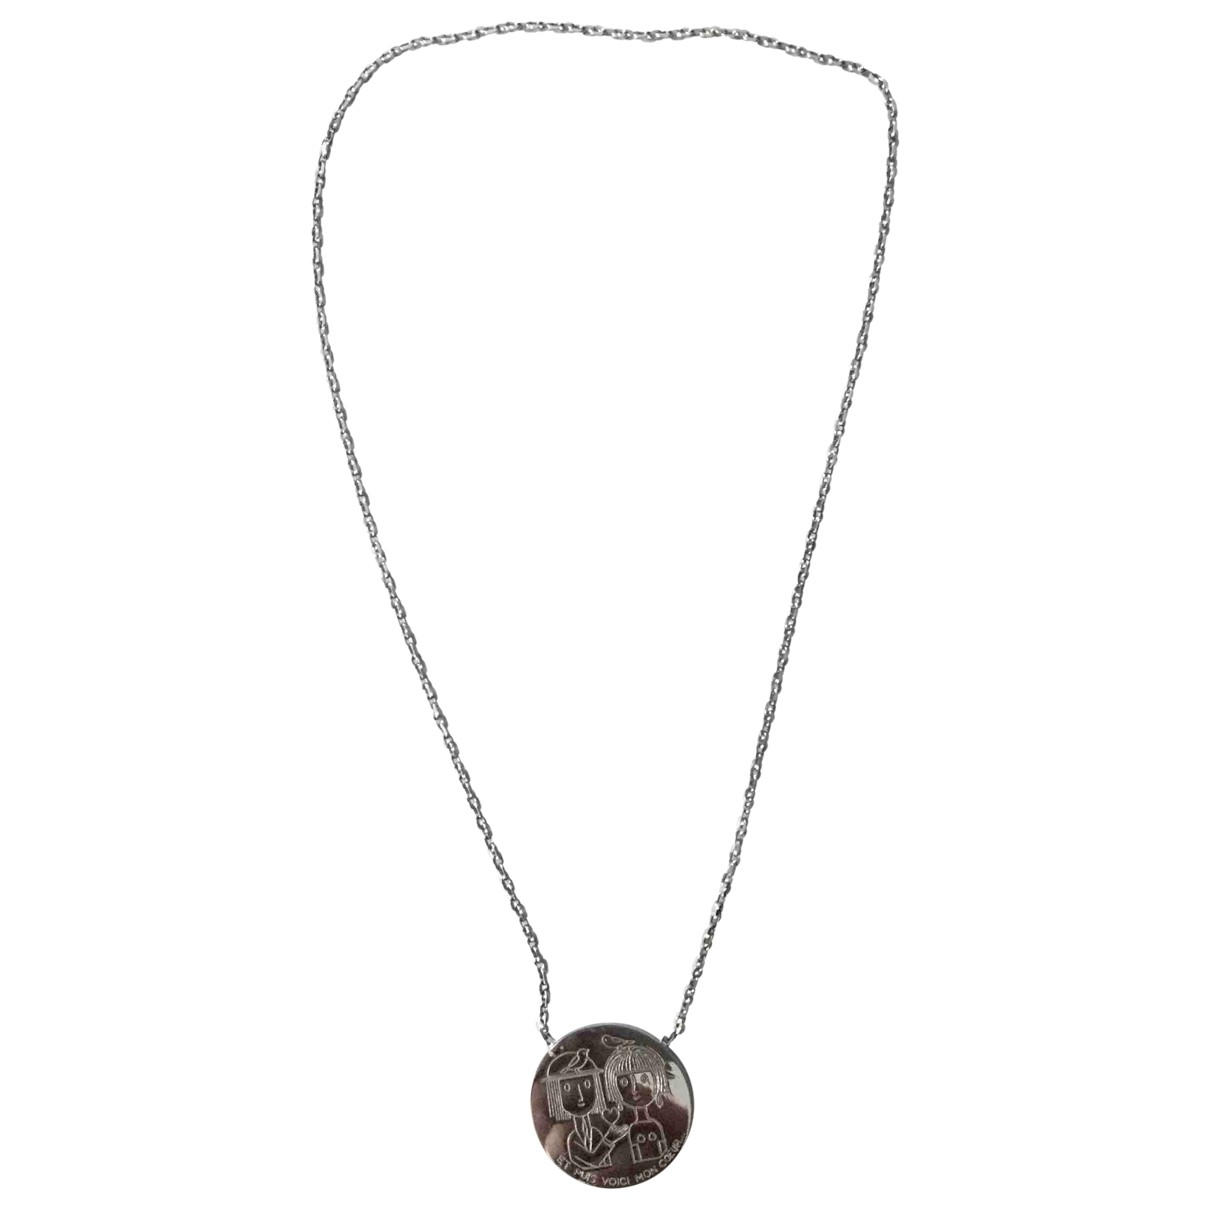 Collar Motifs Coeurs de Plata Non Signe / Unsigned